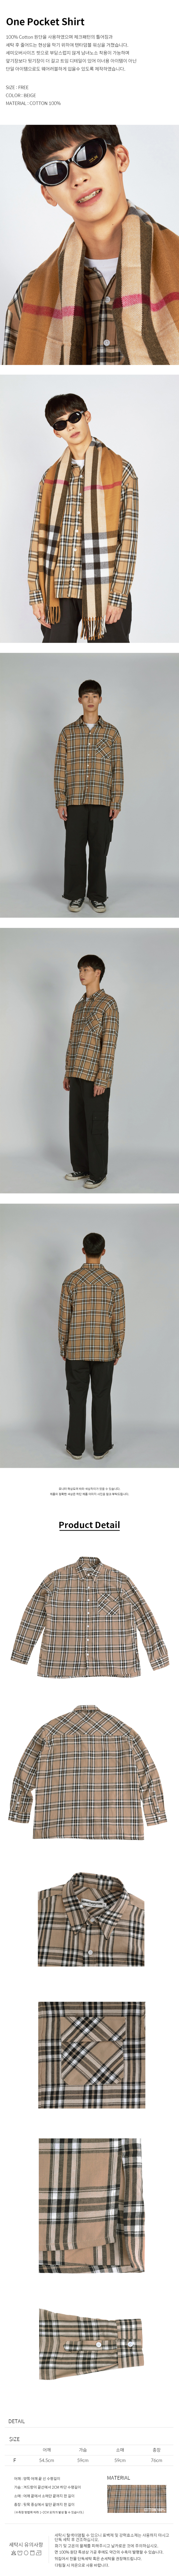 19FW 상세페이지 (베이지 셔츠).jpg